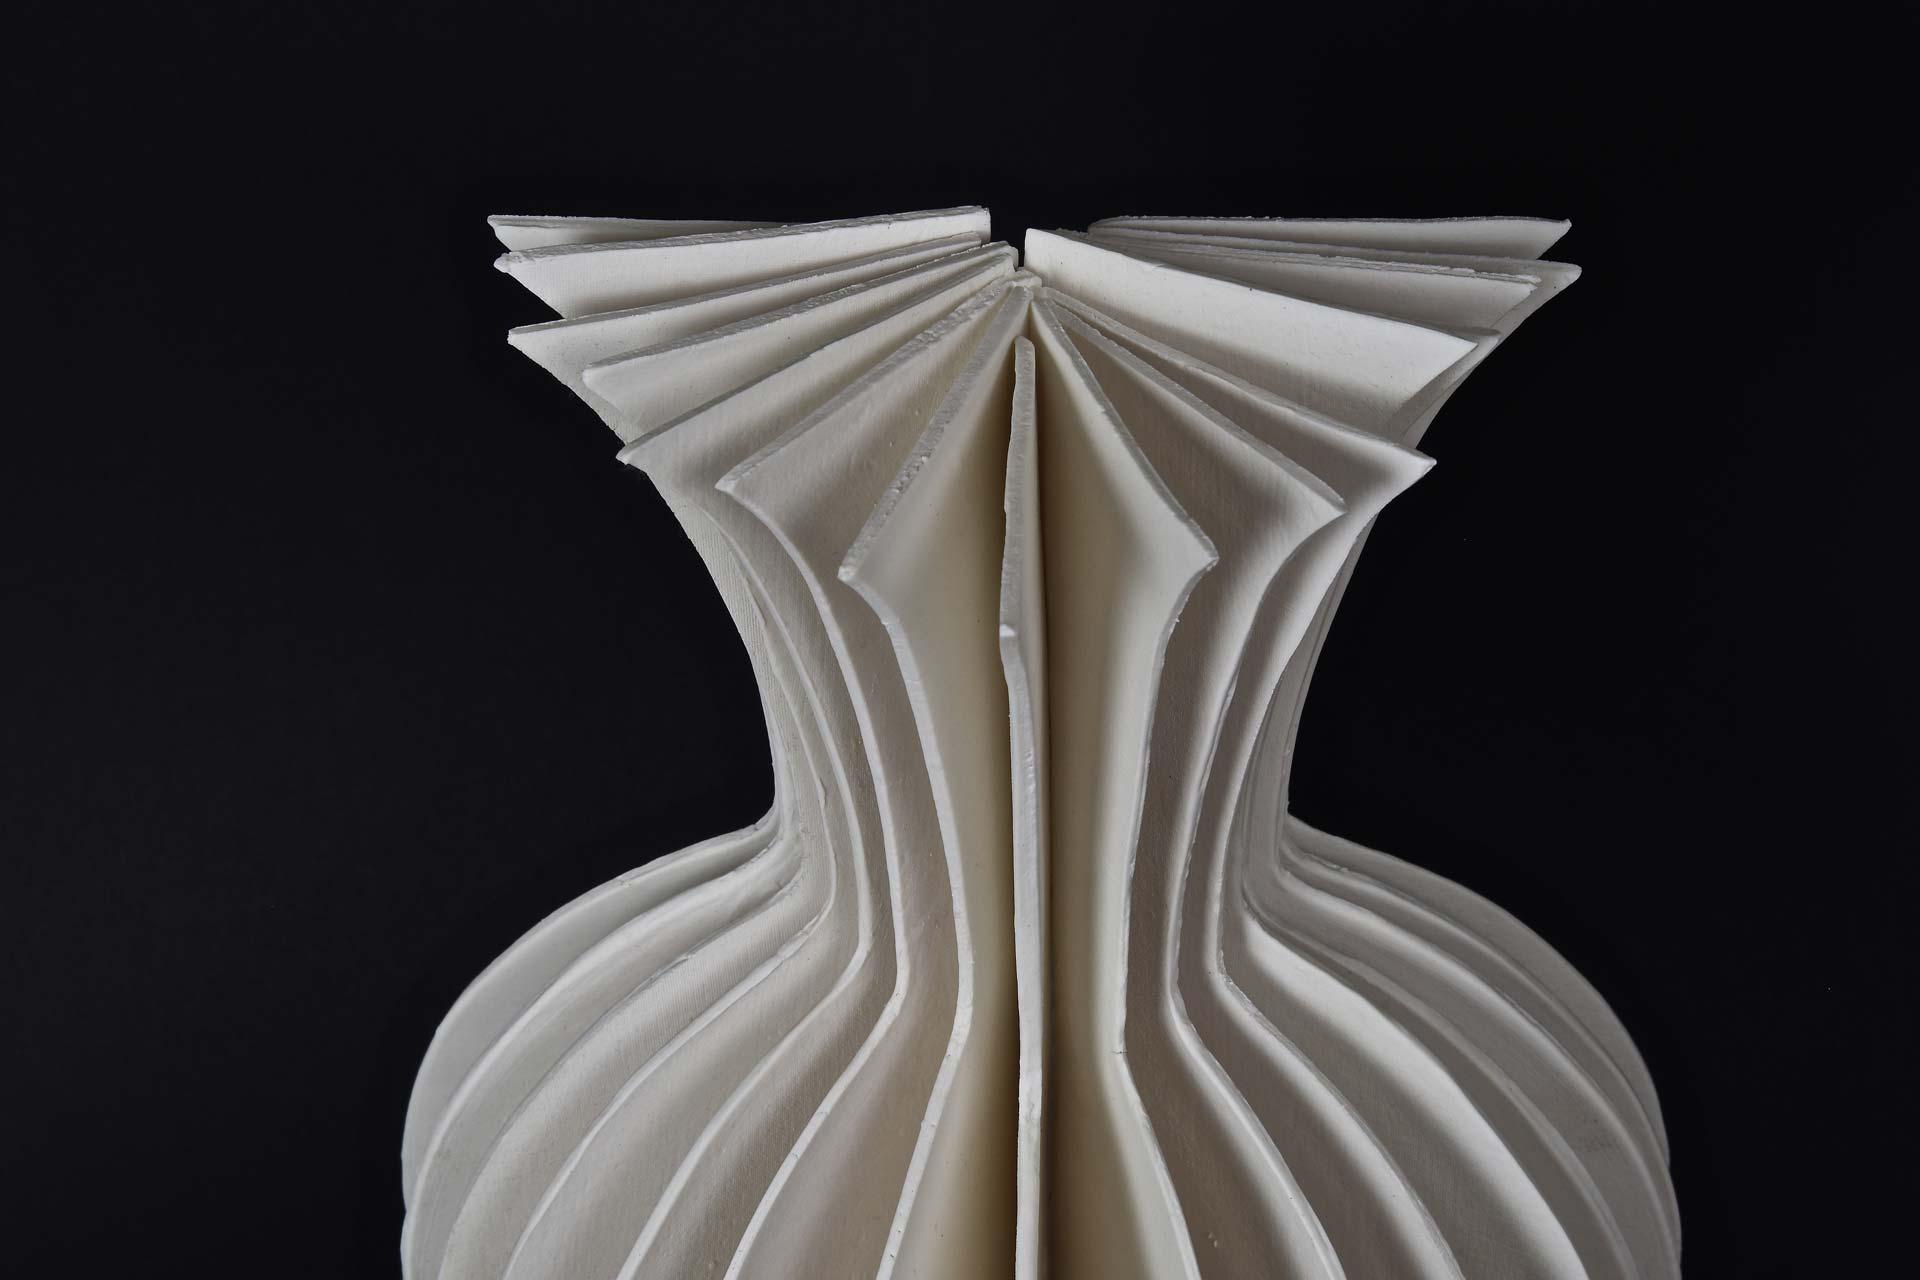 180 gradi - porcellana - 2016